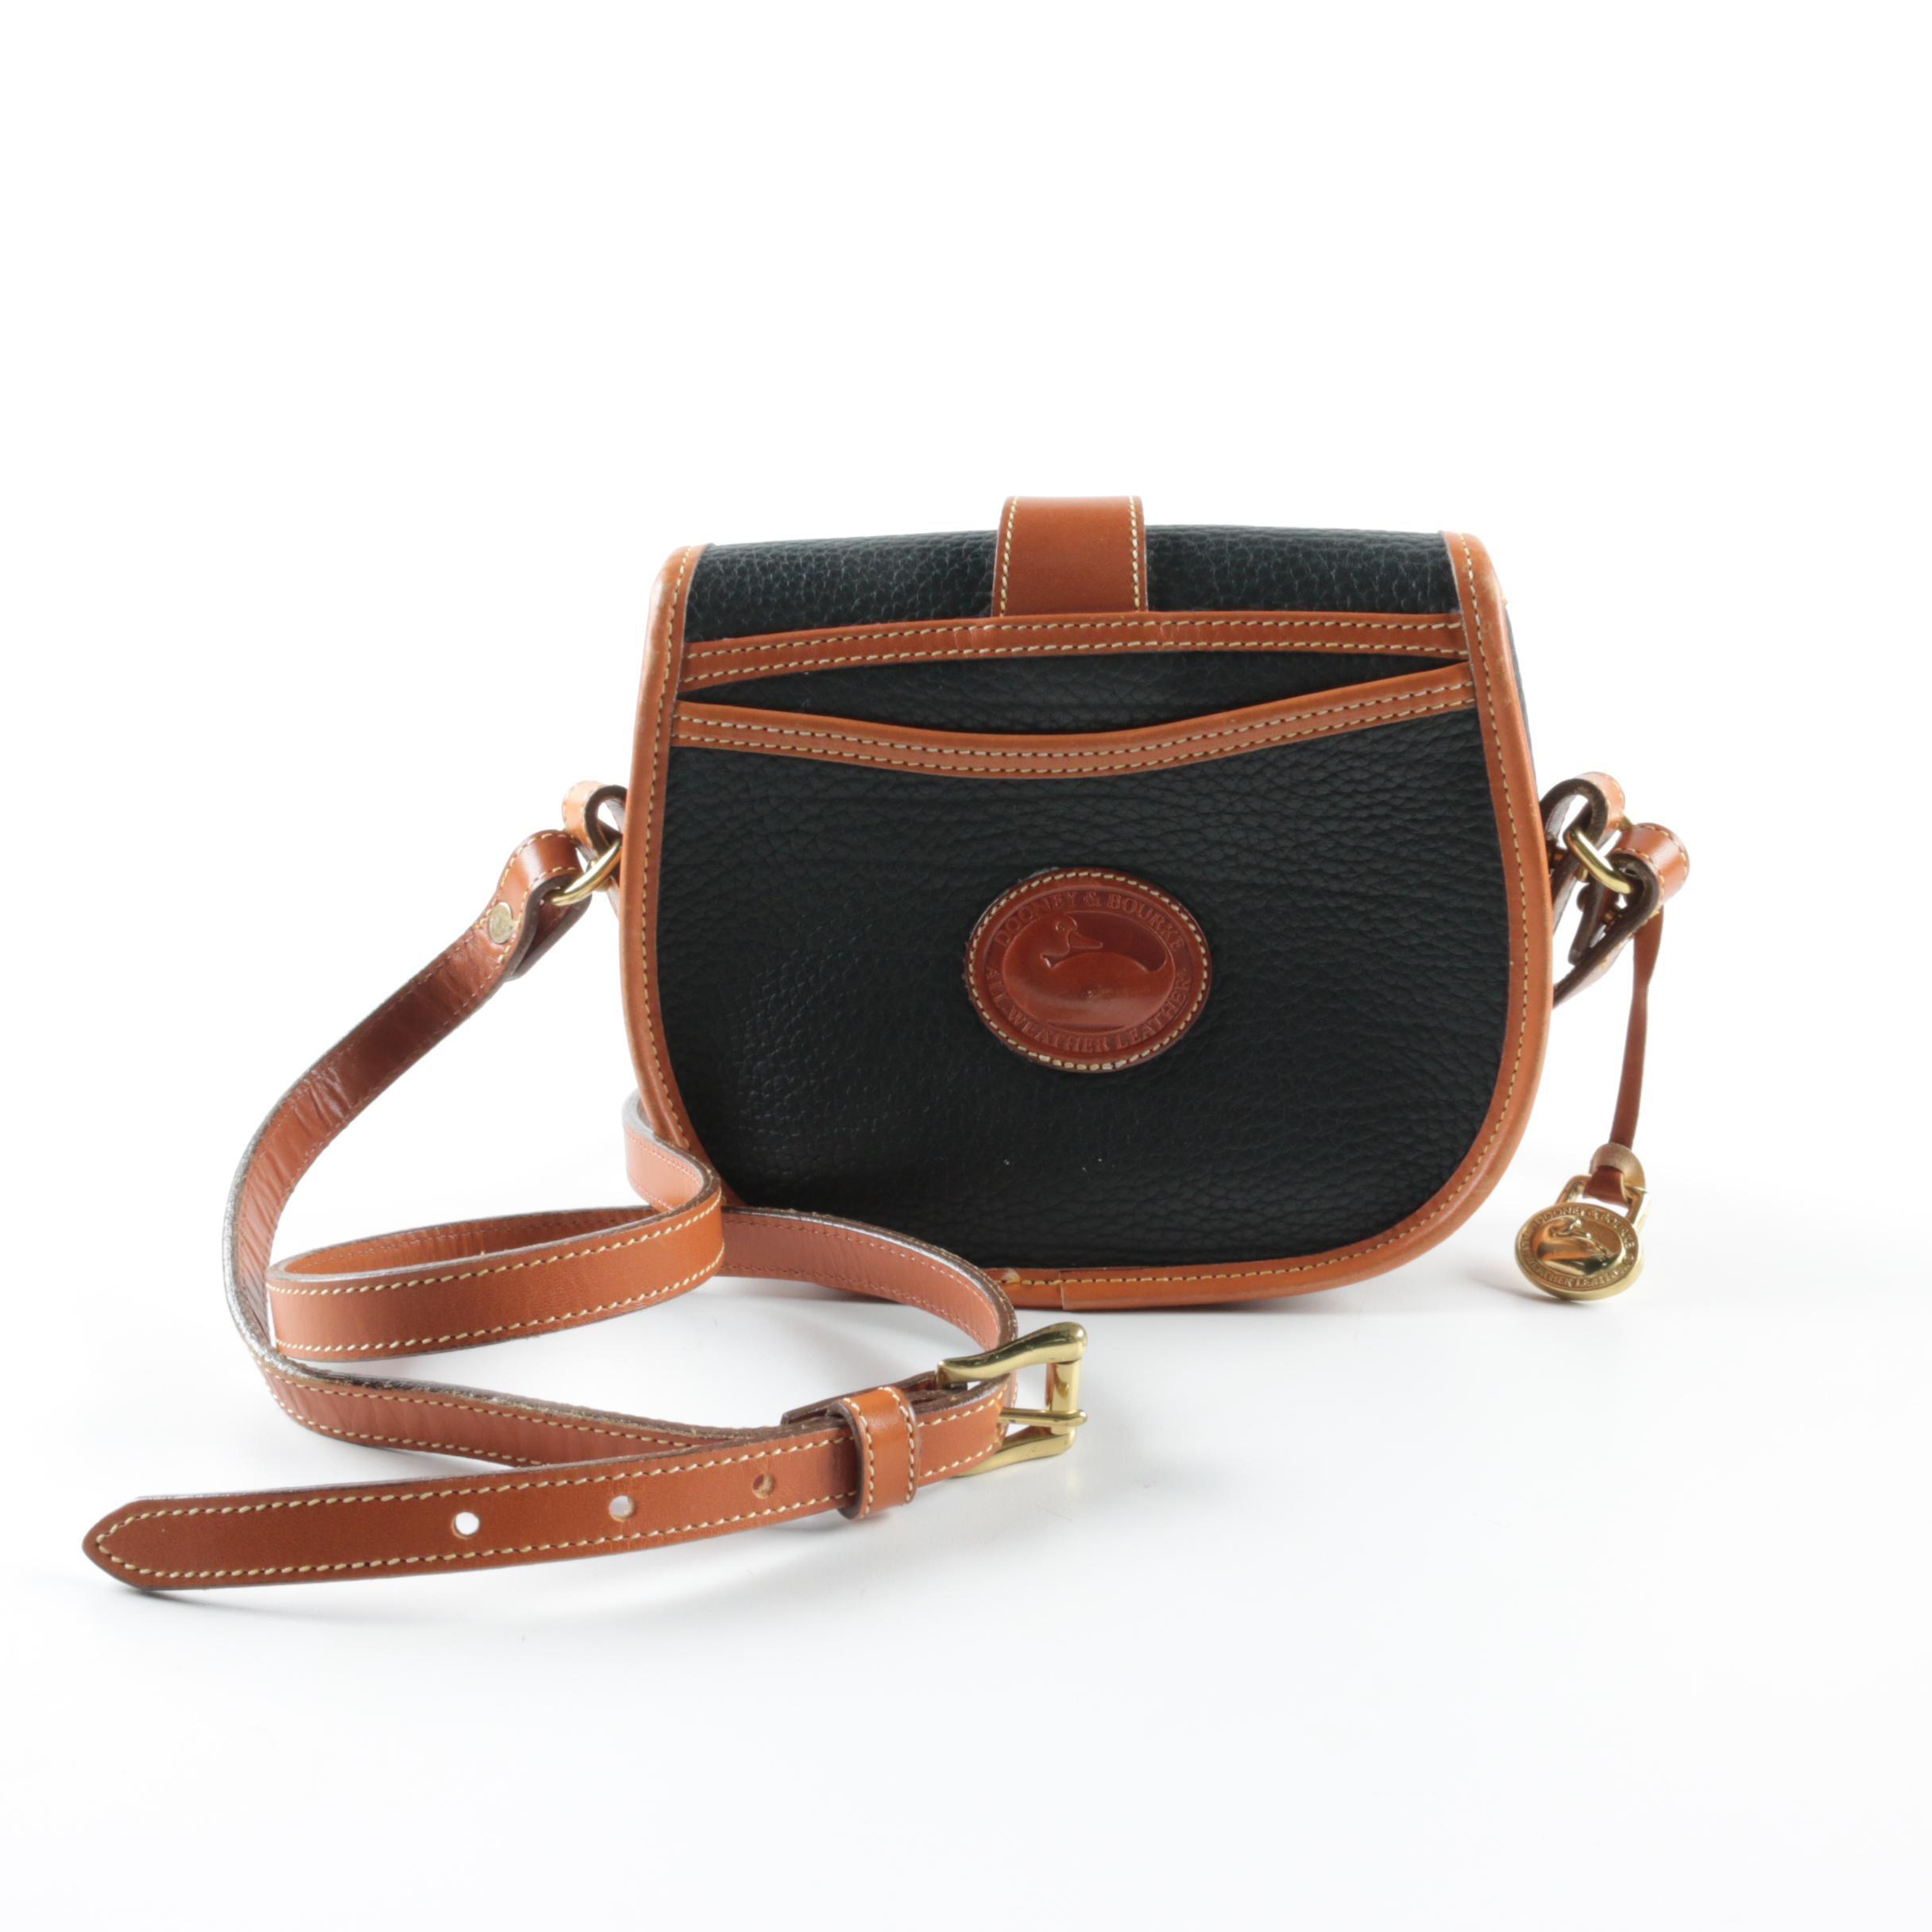 Dooney & Bourke All Weather Leather Saddle Bag